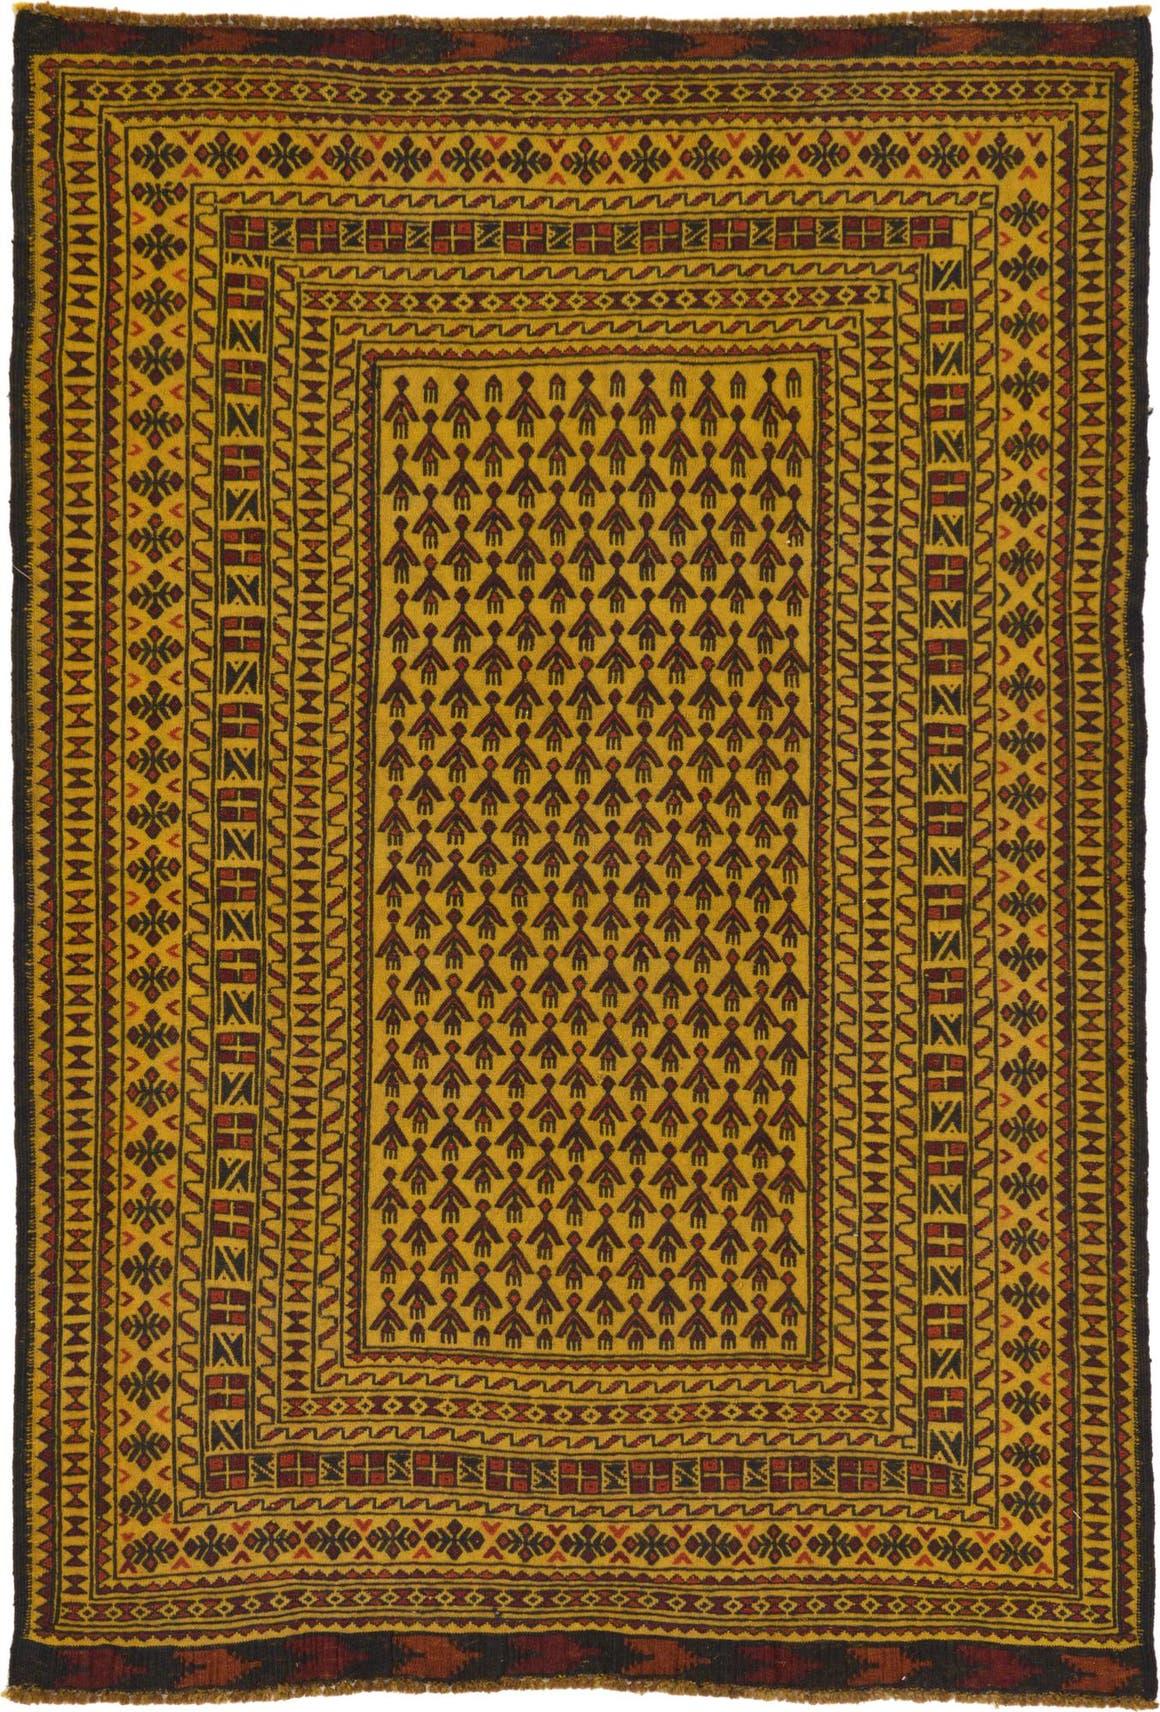 4' 3 x 6' 3 Kilim Afghan Rug main image